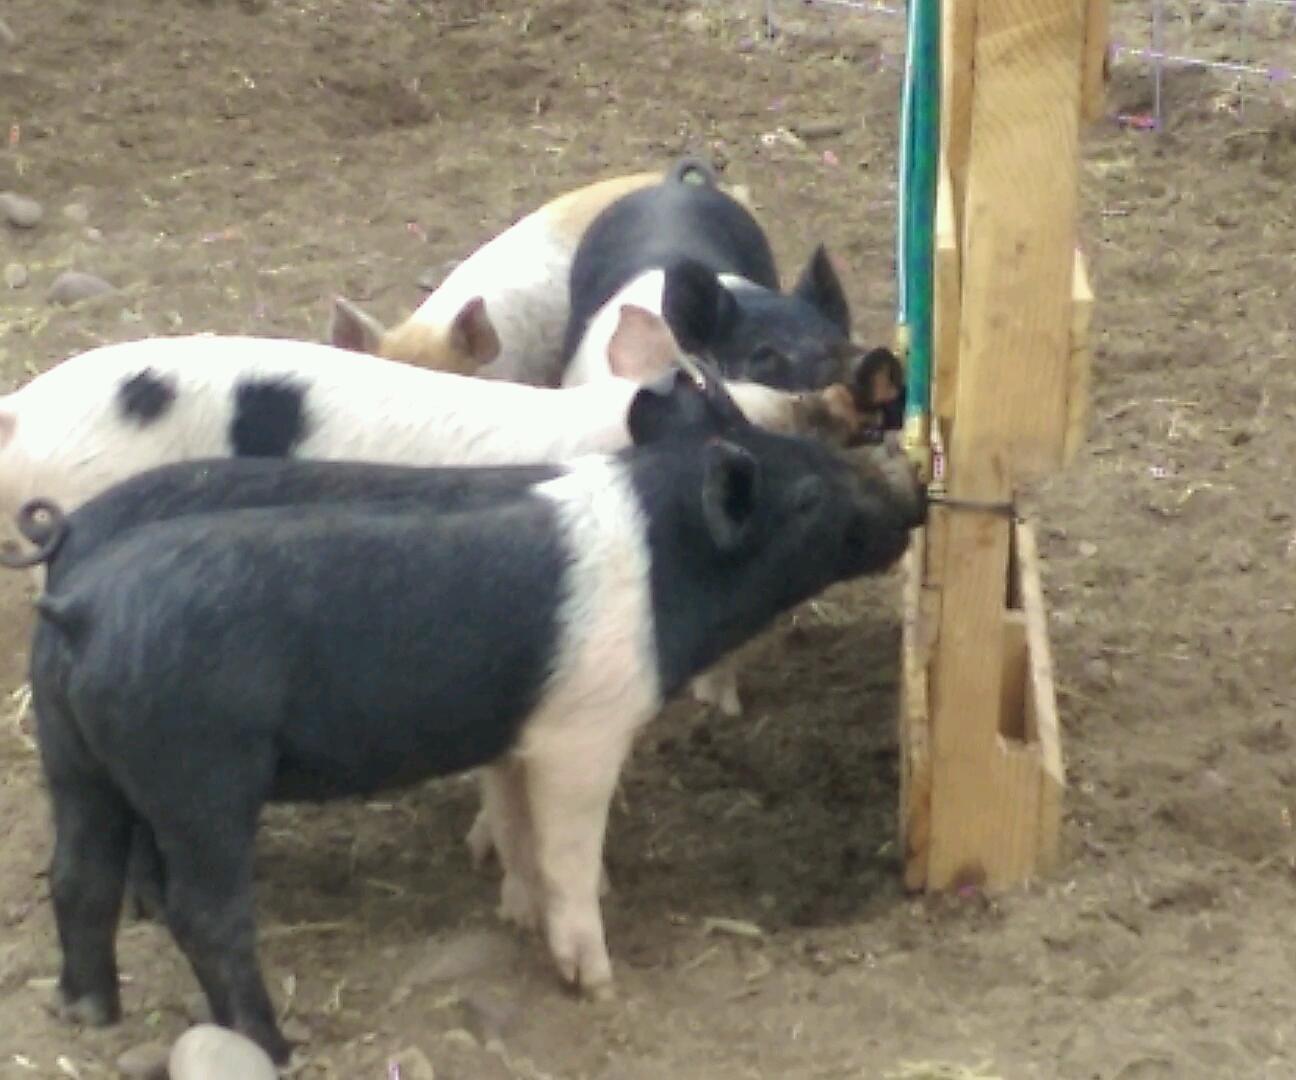 Best hookup websites free no money feeder pigs